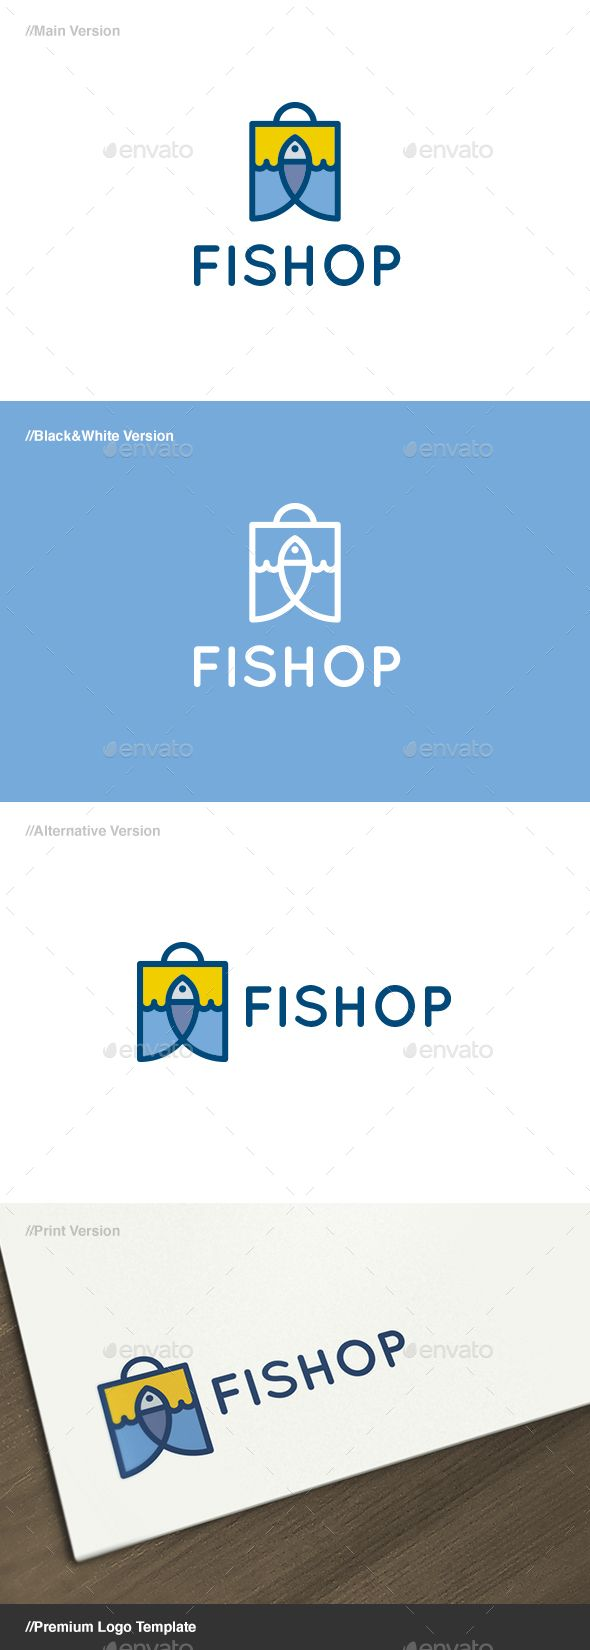 Fishop - Fish & Bag Logo Template Vector EPS, AI Illustrator. Download here: https://graphicriver.net/item/fishop-fish-bag-logo/17606773?ref=ksioks